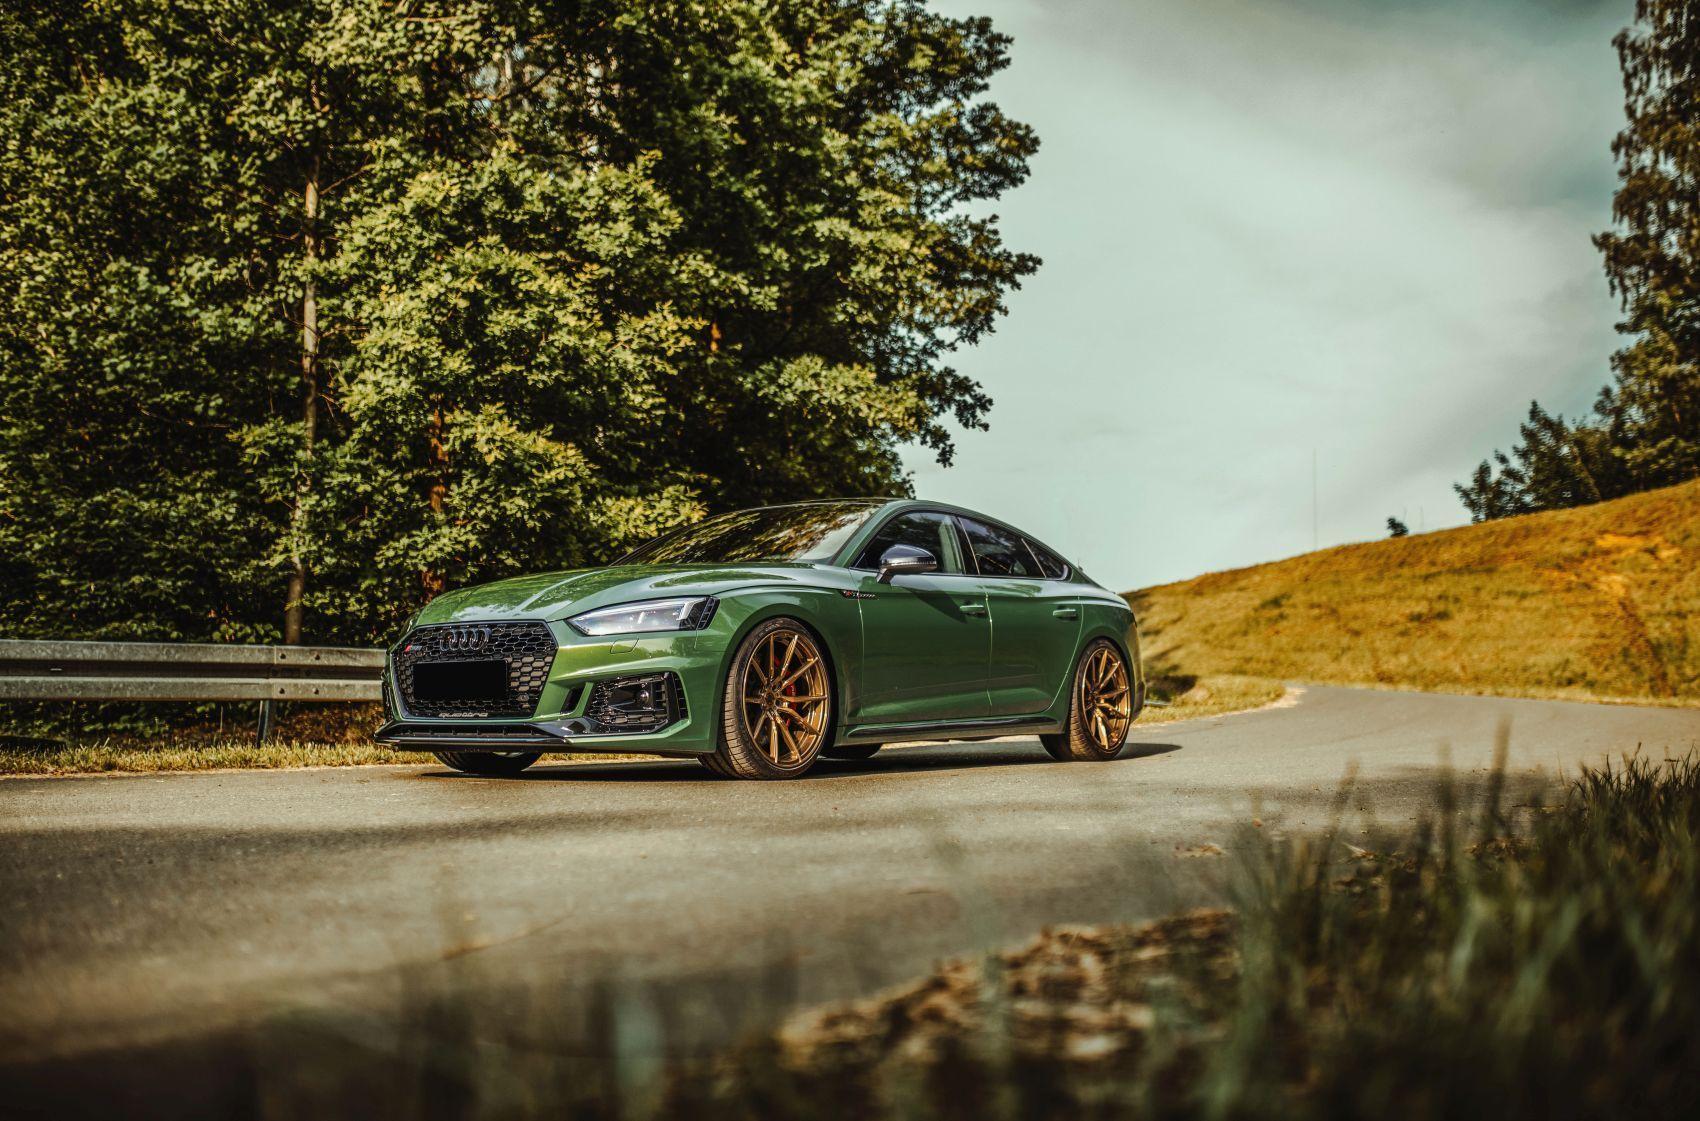 B9 Rs5 With Bronze Concaver Aftermarket Wheels Bronze Wheels Audi Audi Rs5